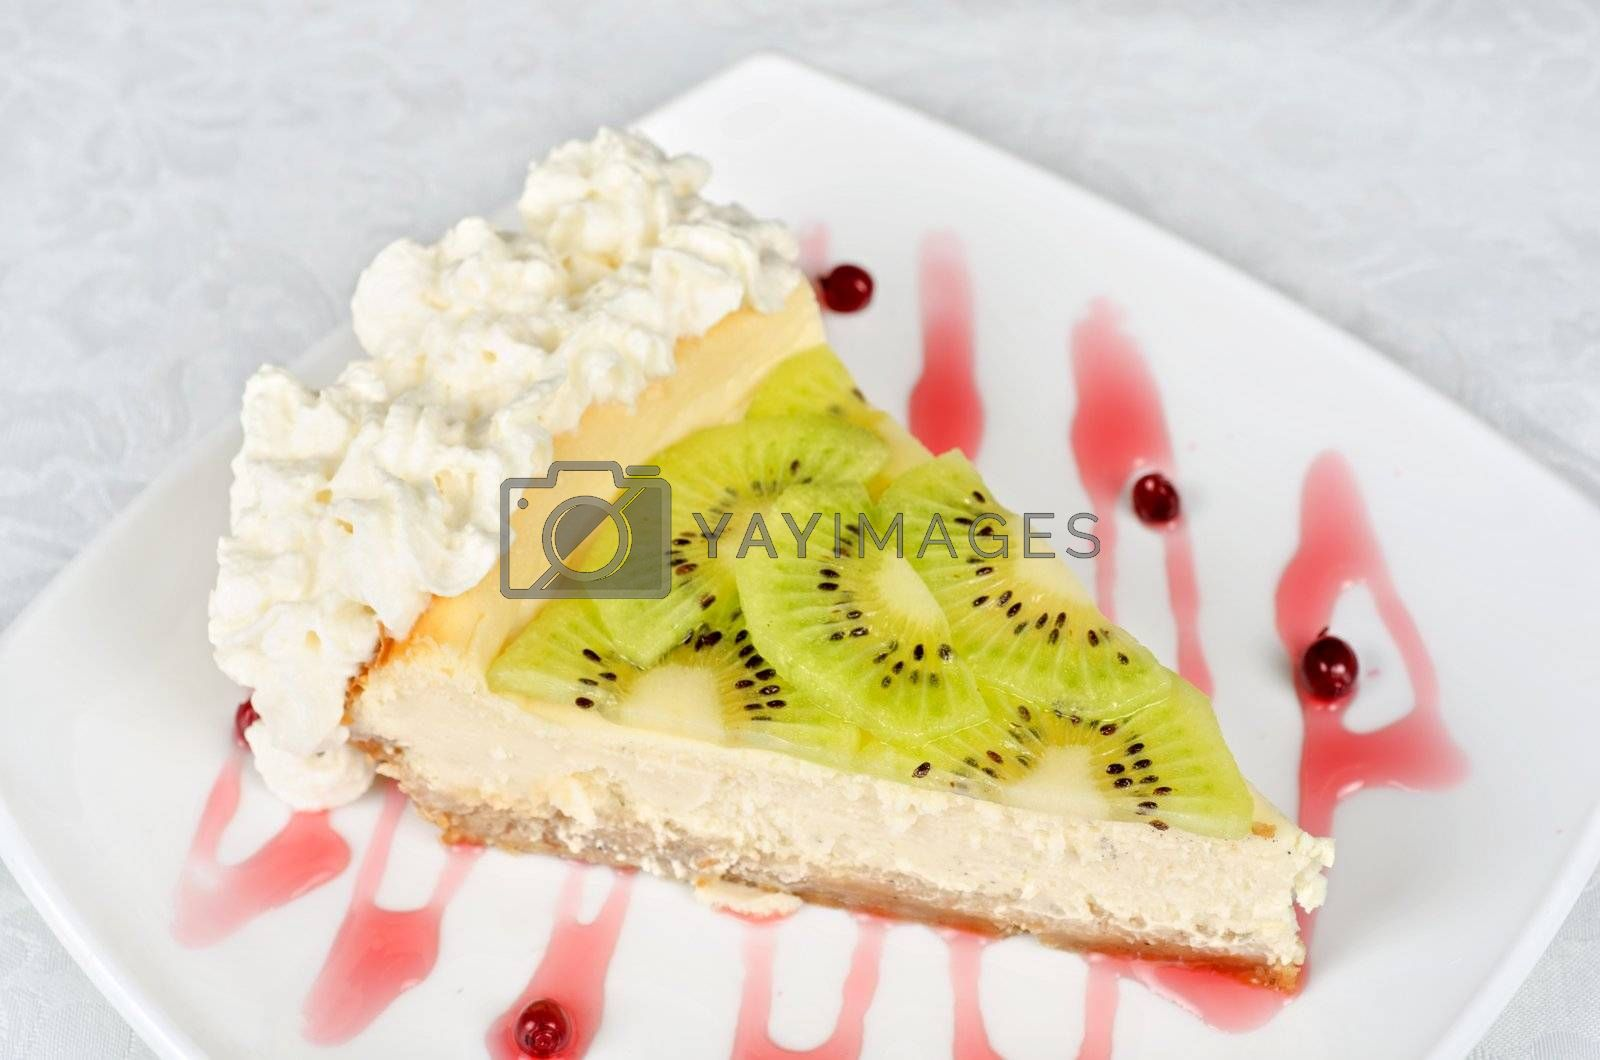 tasty kiwi fresh cake closeup at plate